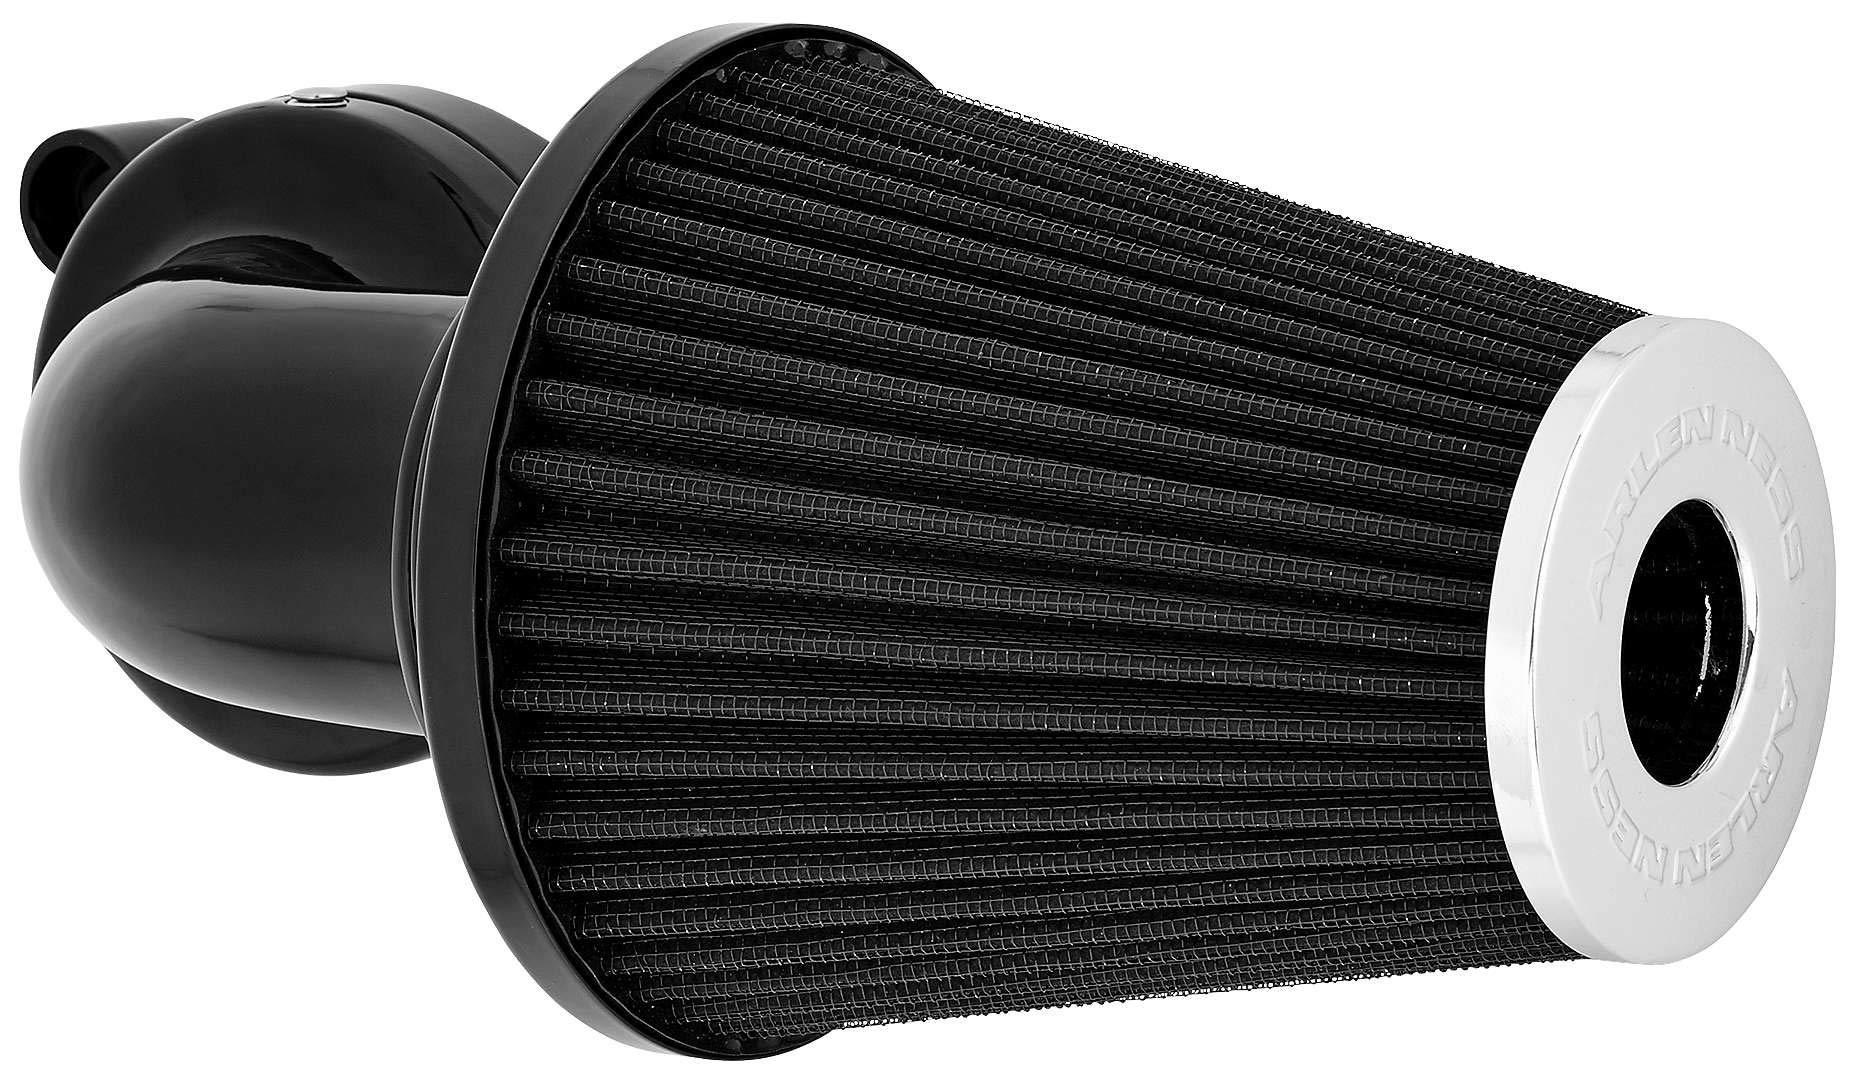 08-16 HARLEY FLHX2: Arlen Ness Monster Big Sucker Intake Kit (No Cover) (Black)